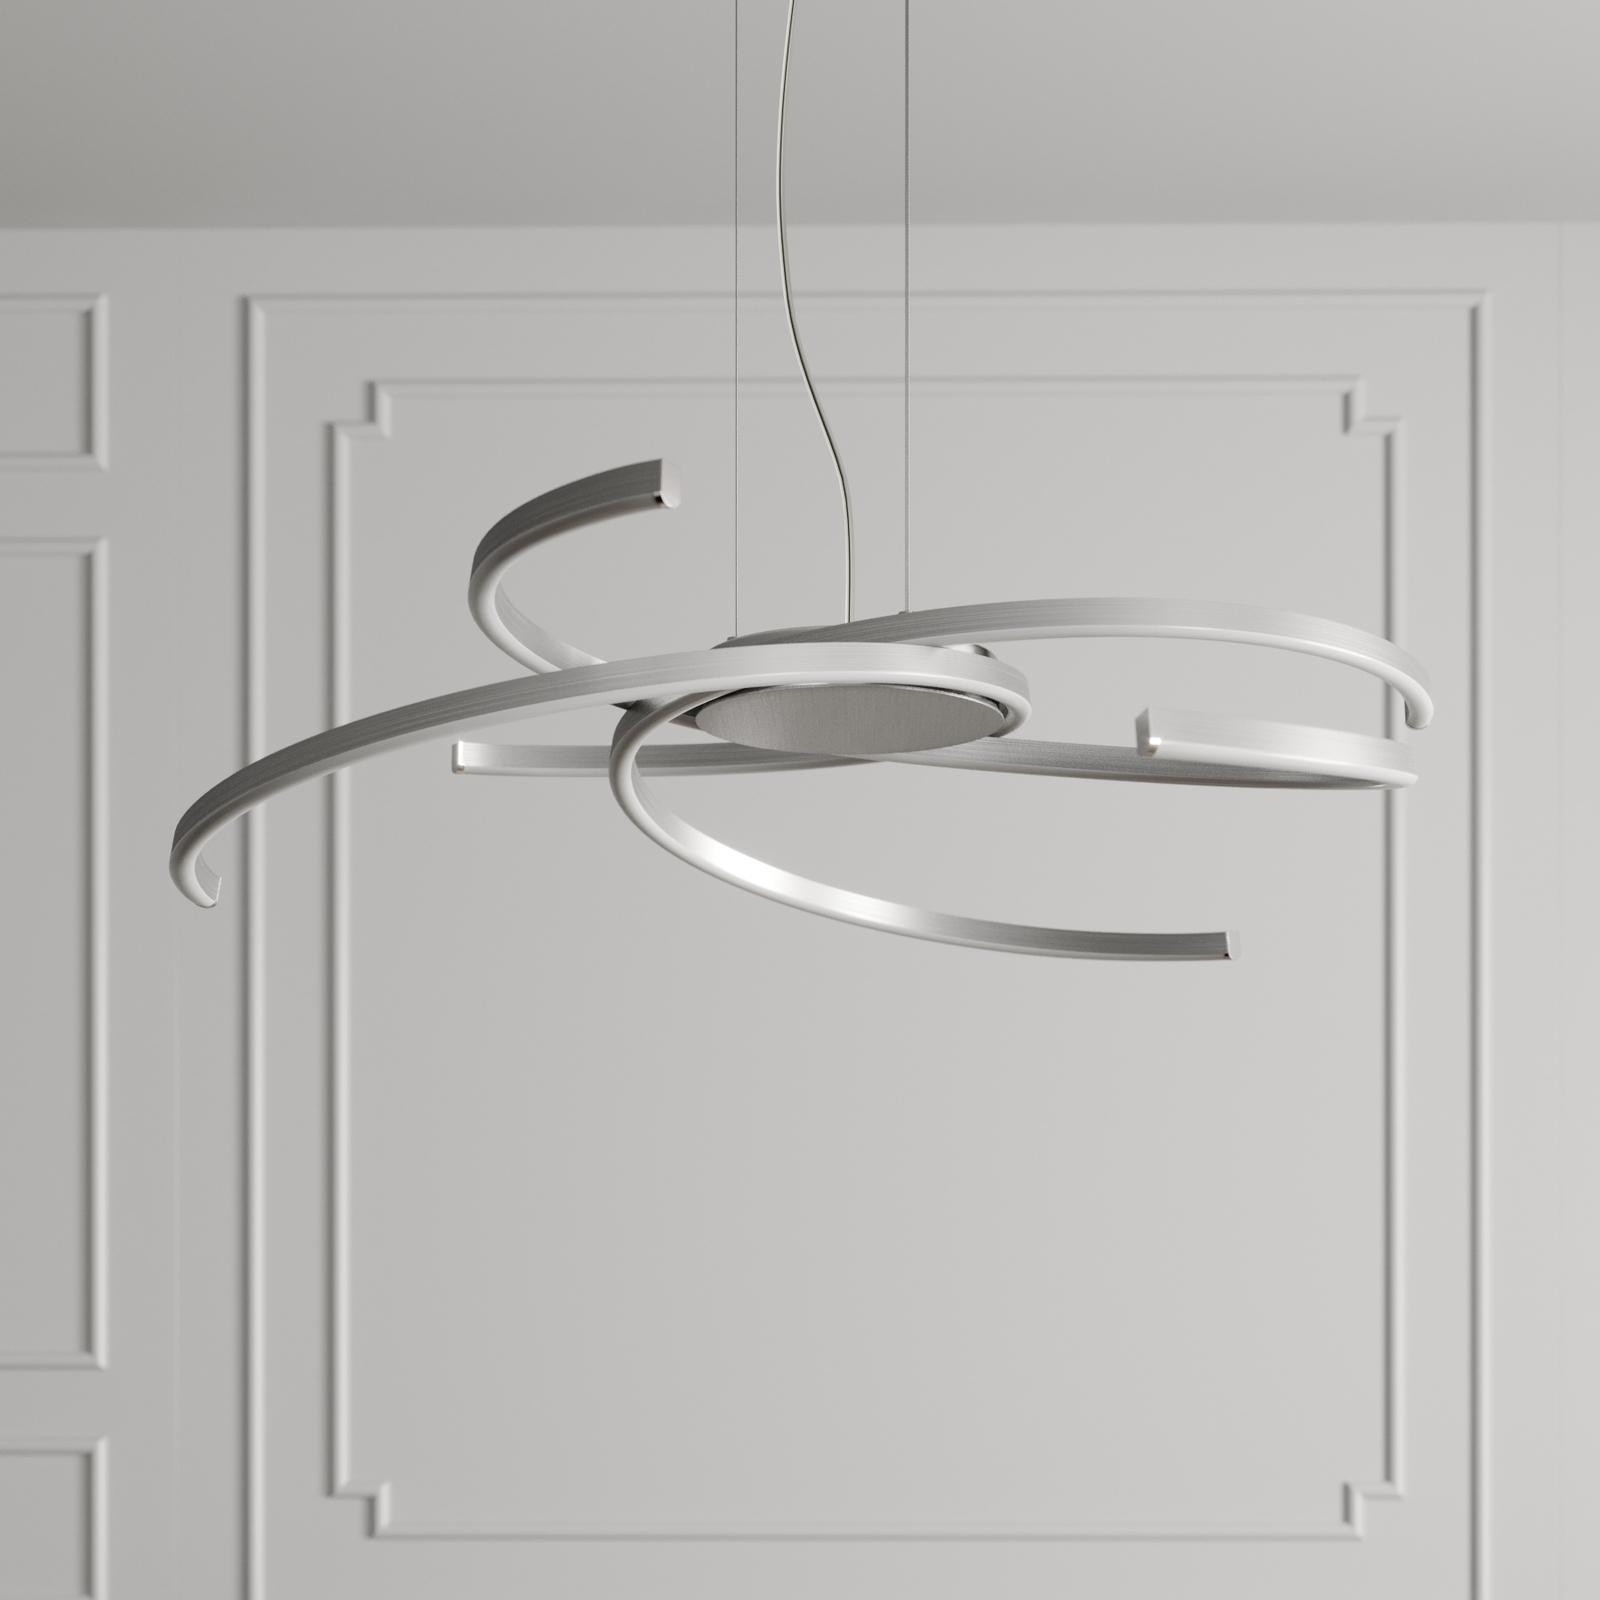 Lindby Katris lampa wisząca LED, 73 cm, aluminium